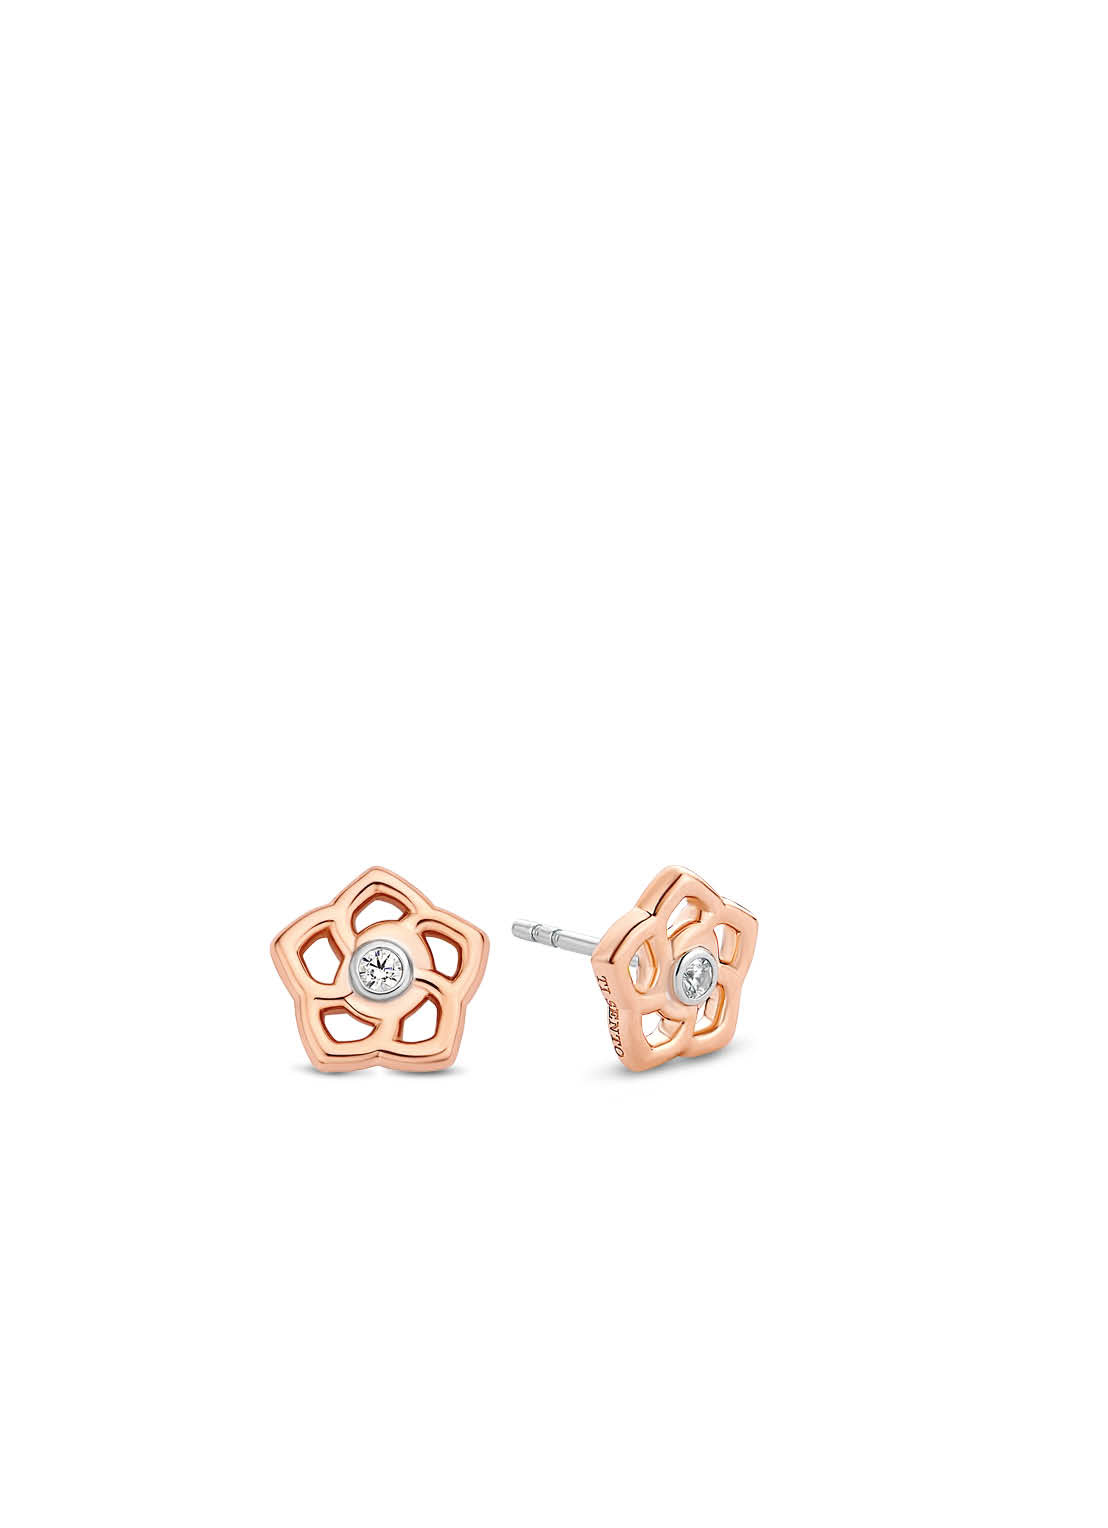 TI SENTO - Milano Earrings 7809ZR-3